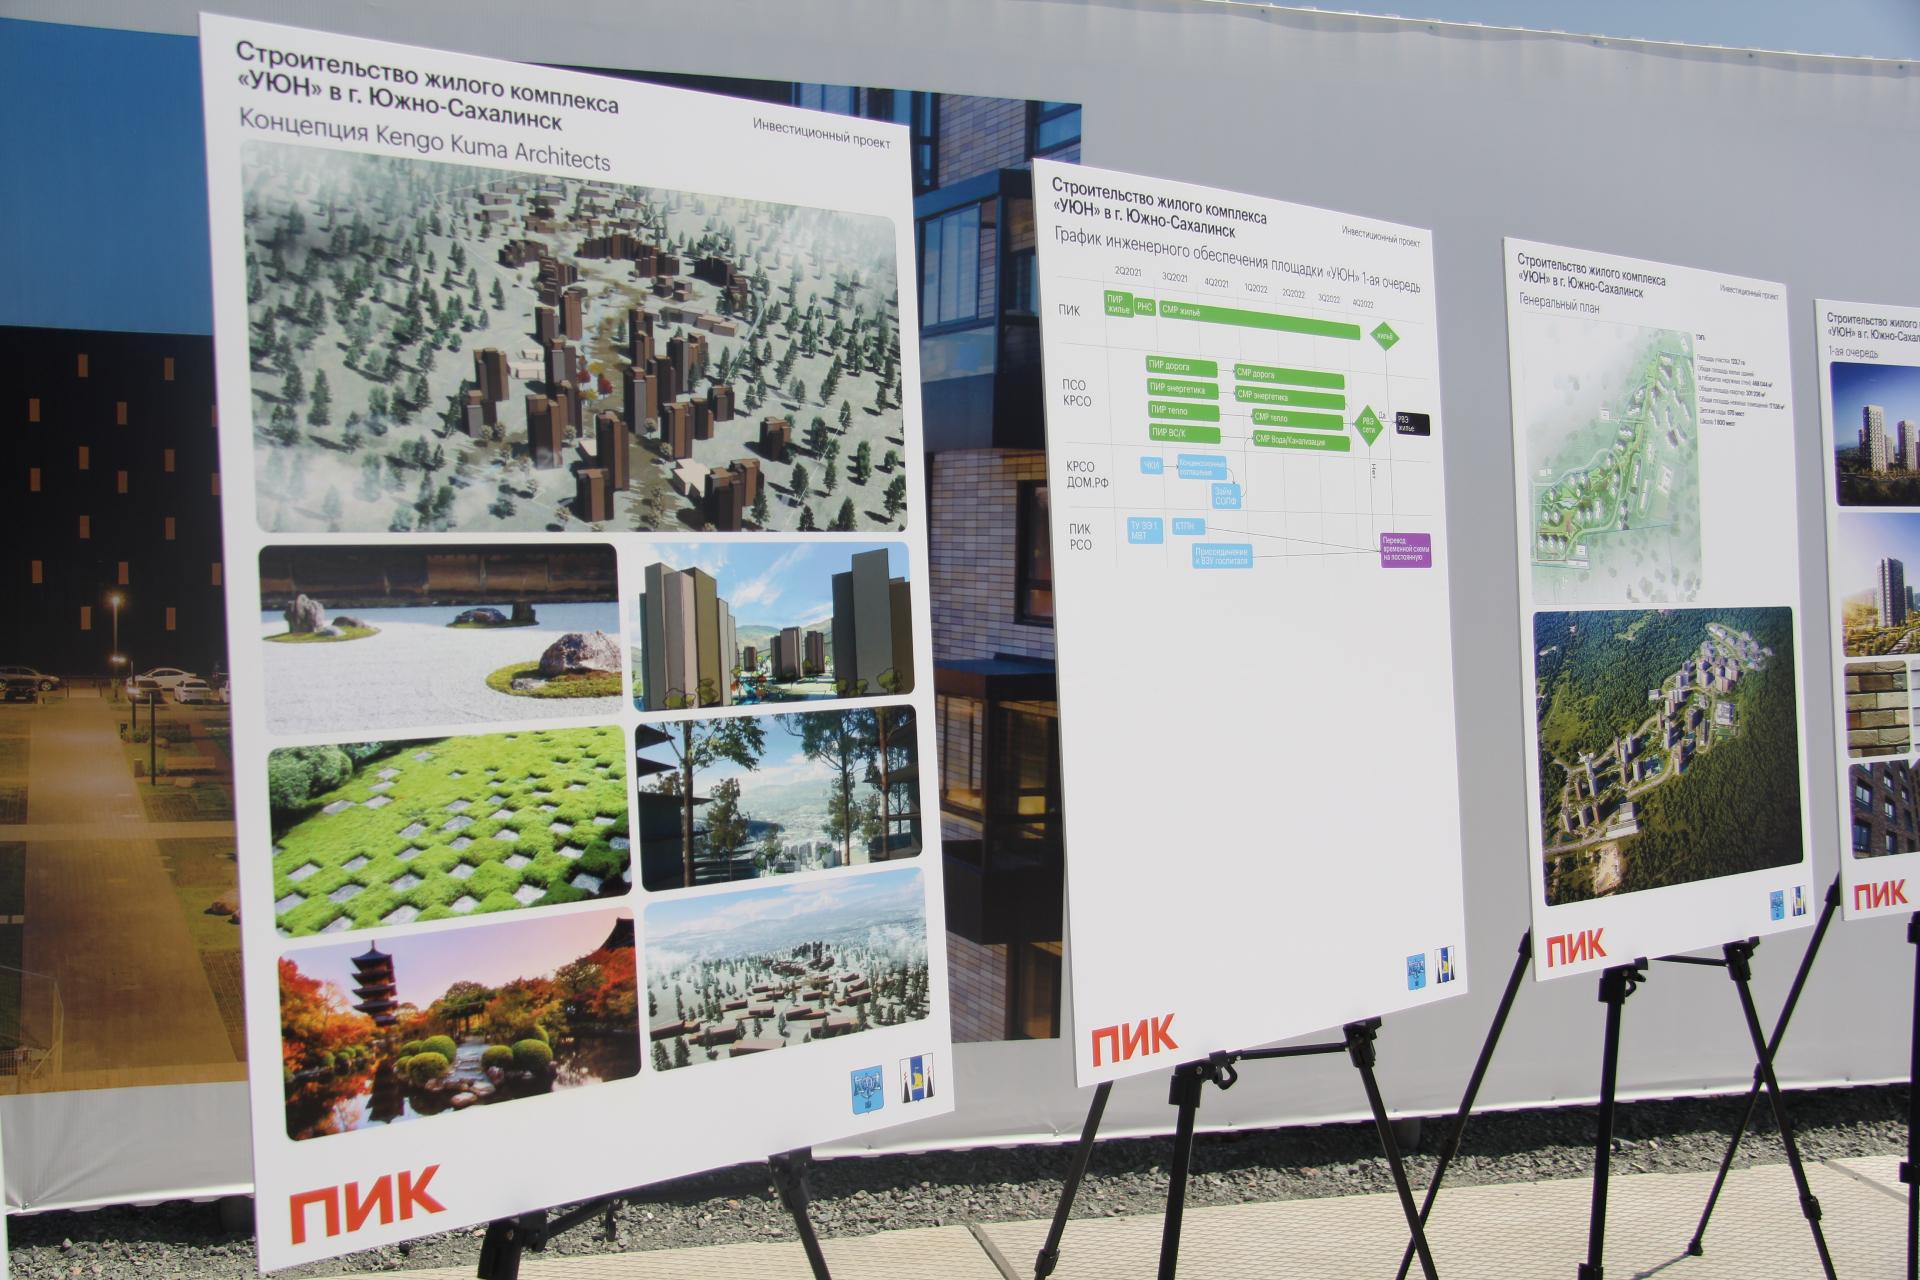 Проект строительства ЖК «Уюн» в Южно-Сахалинске